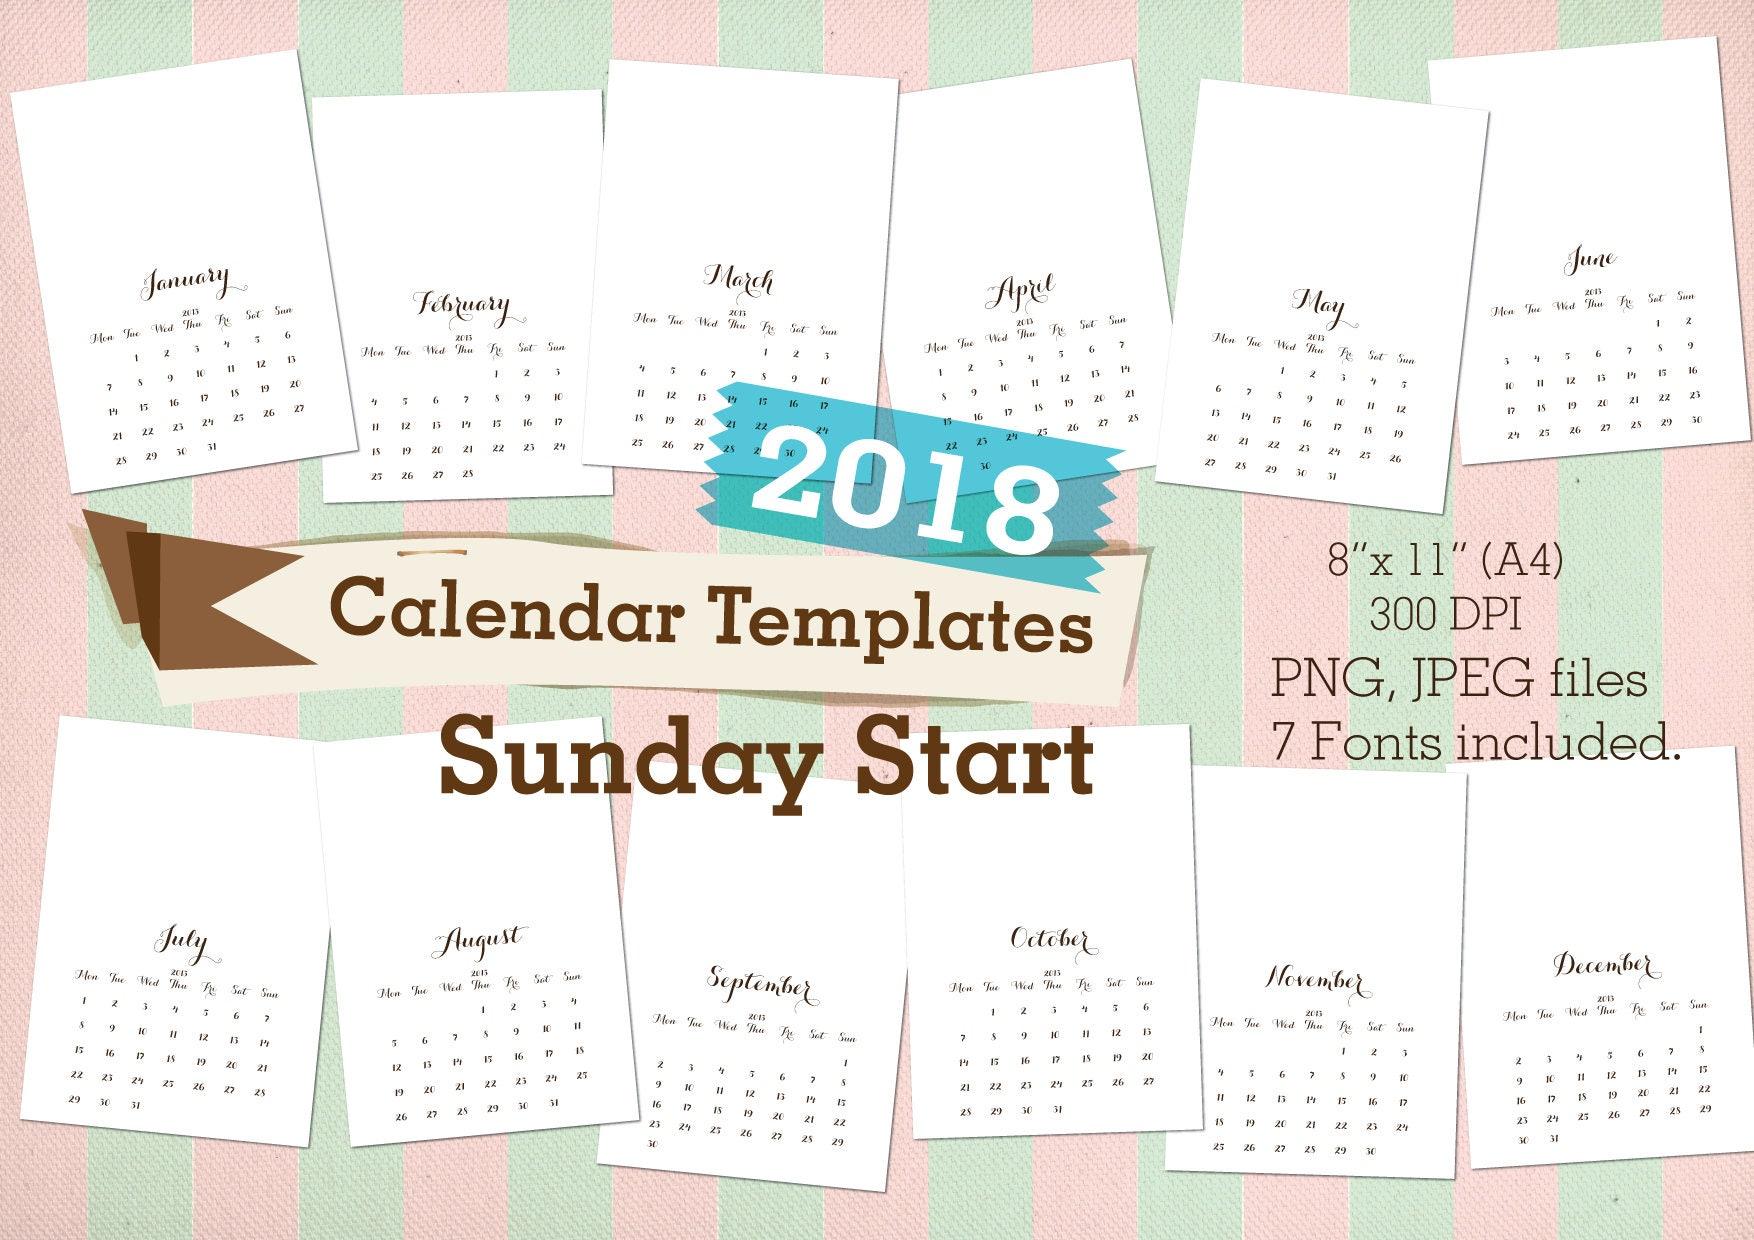 cool calendars 2018